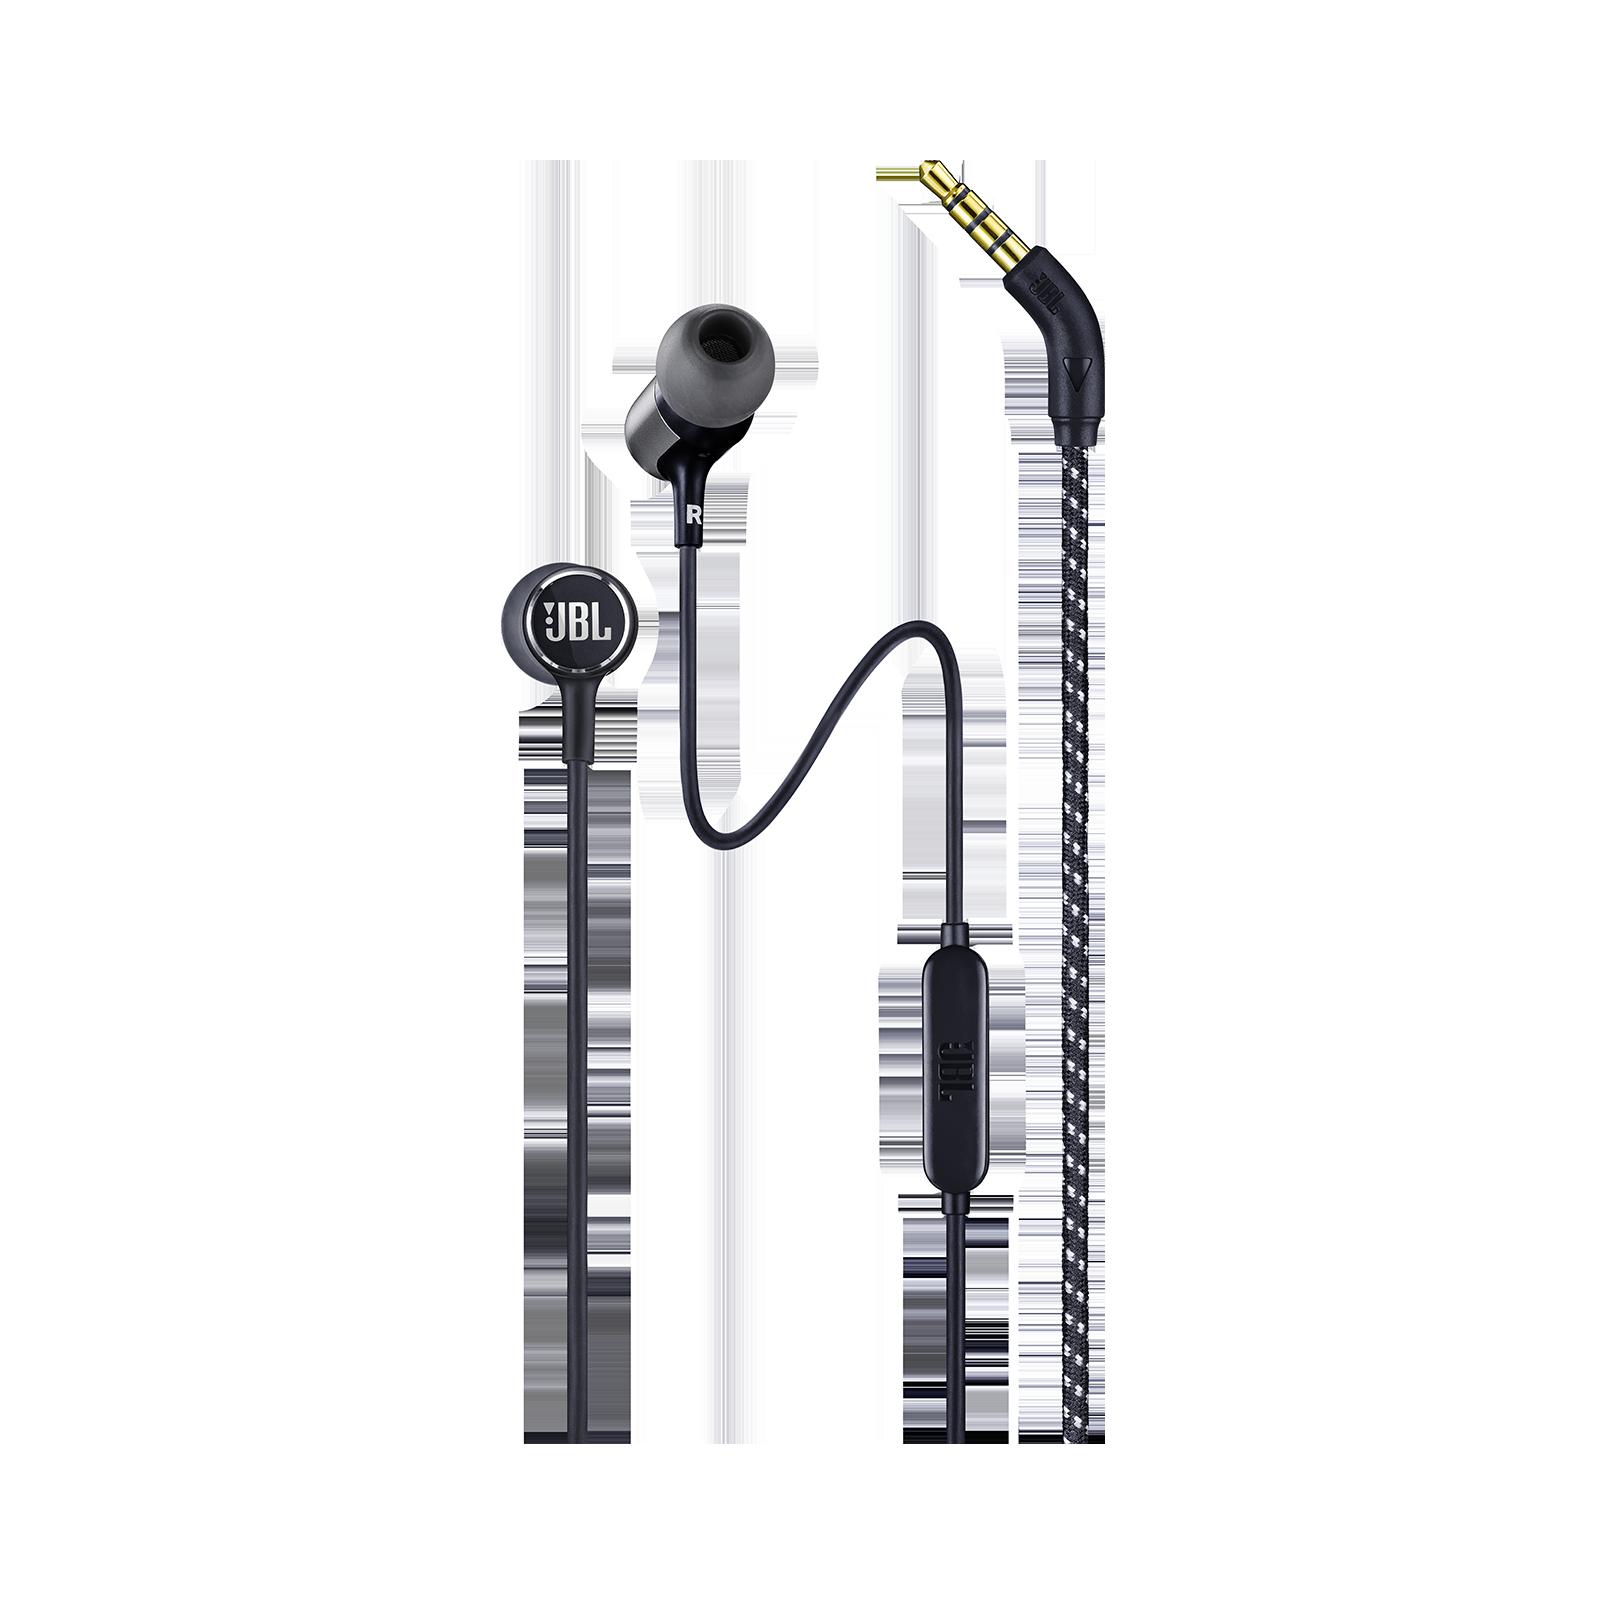 Jbl earbuds harman - samsung earbuds bulk